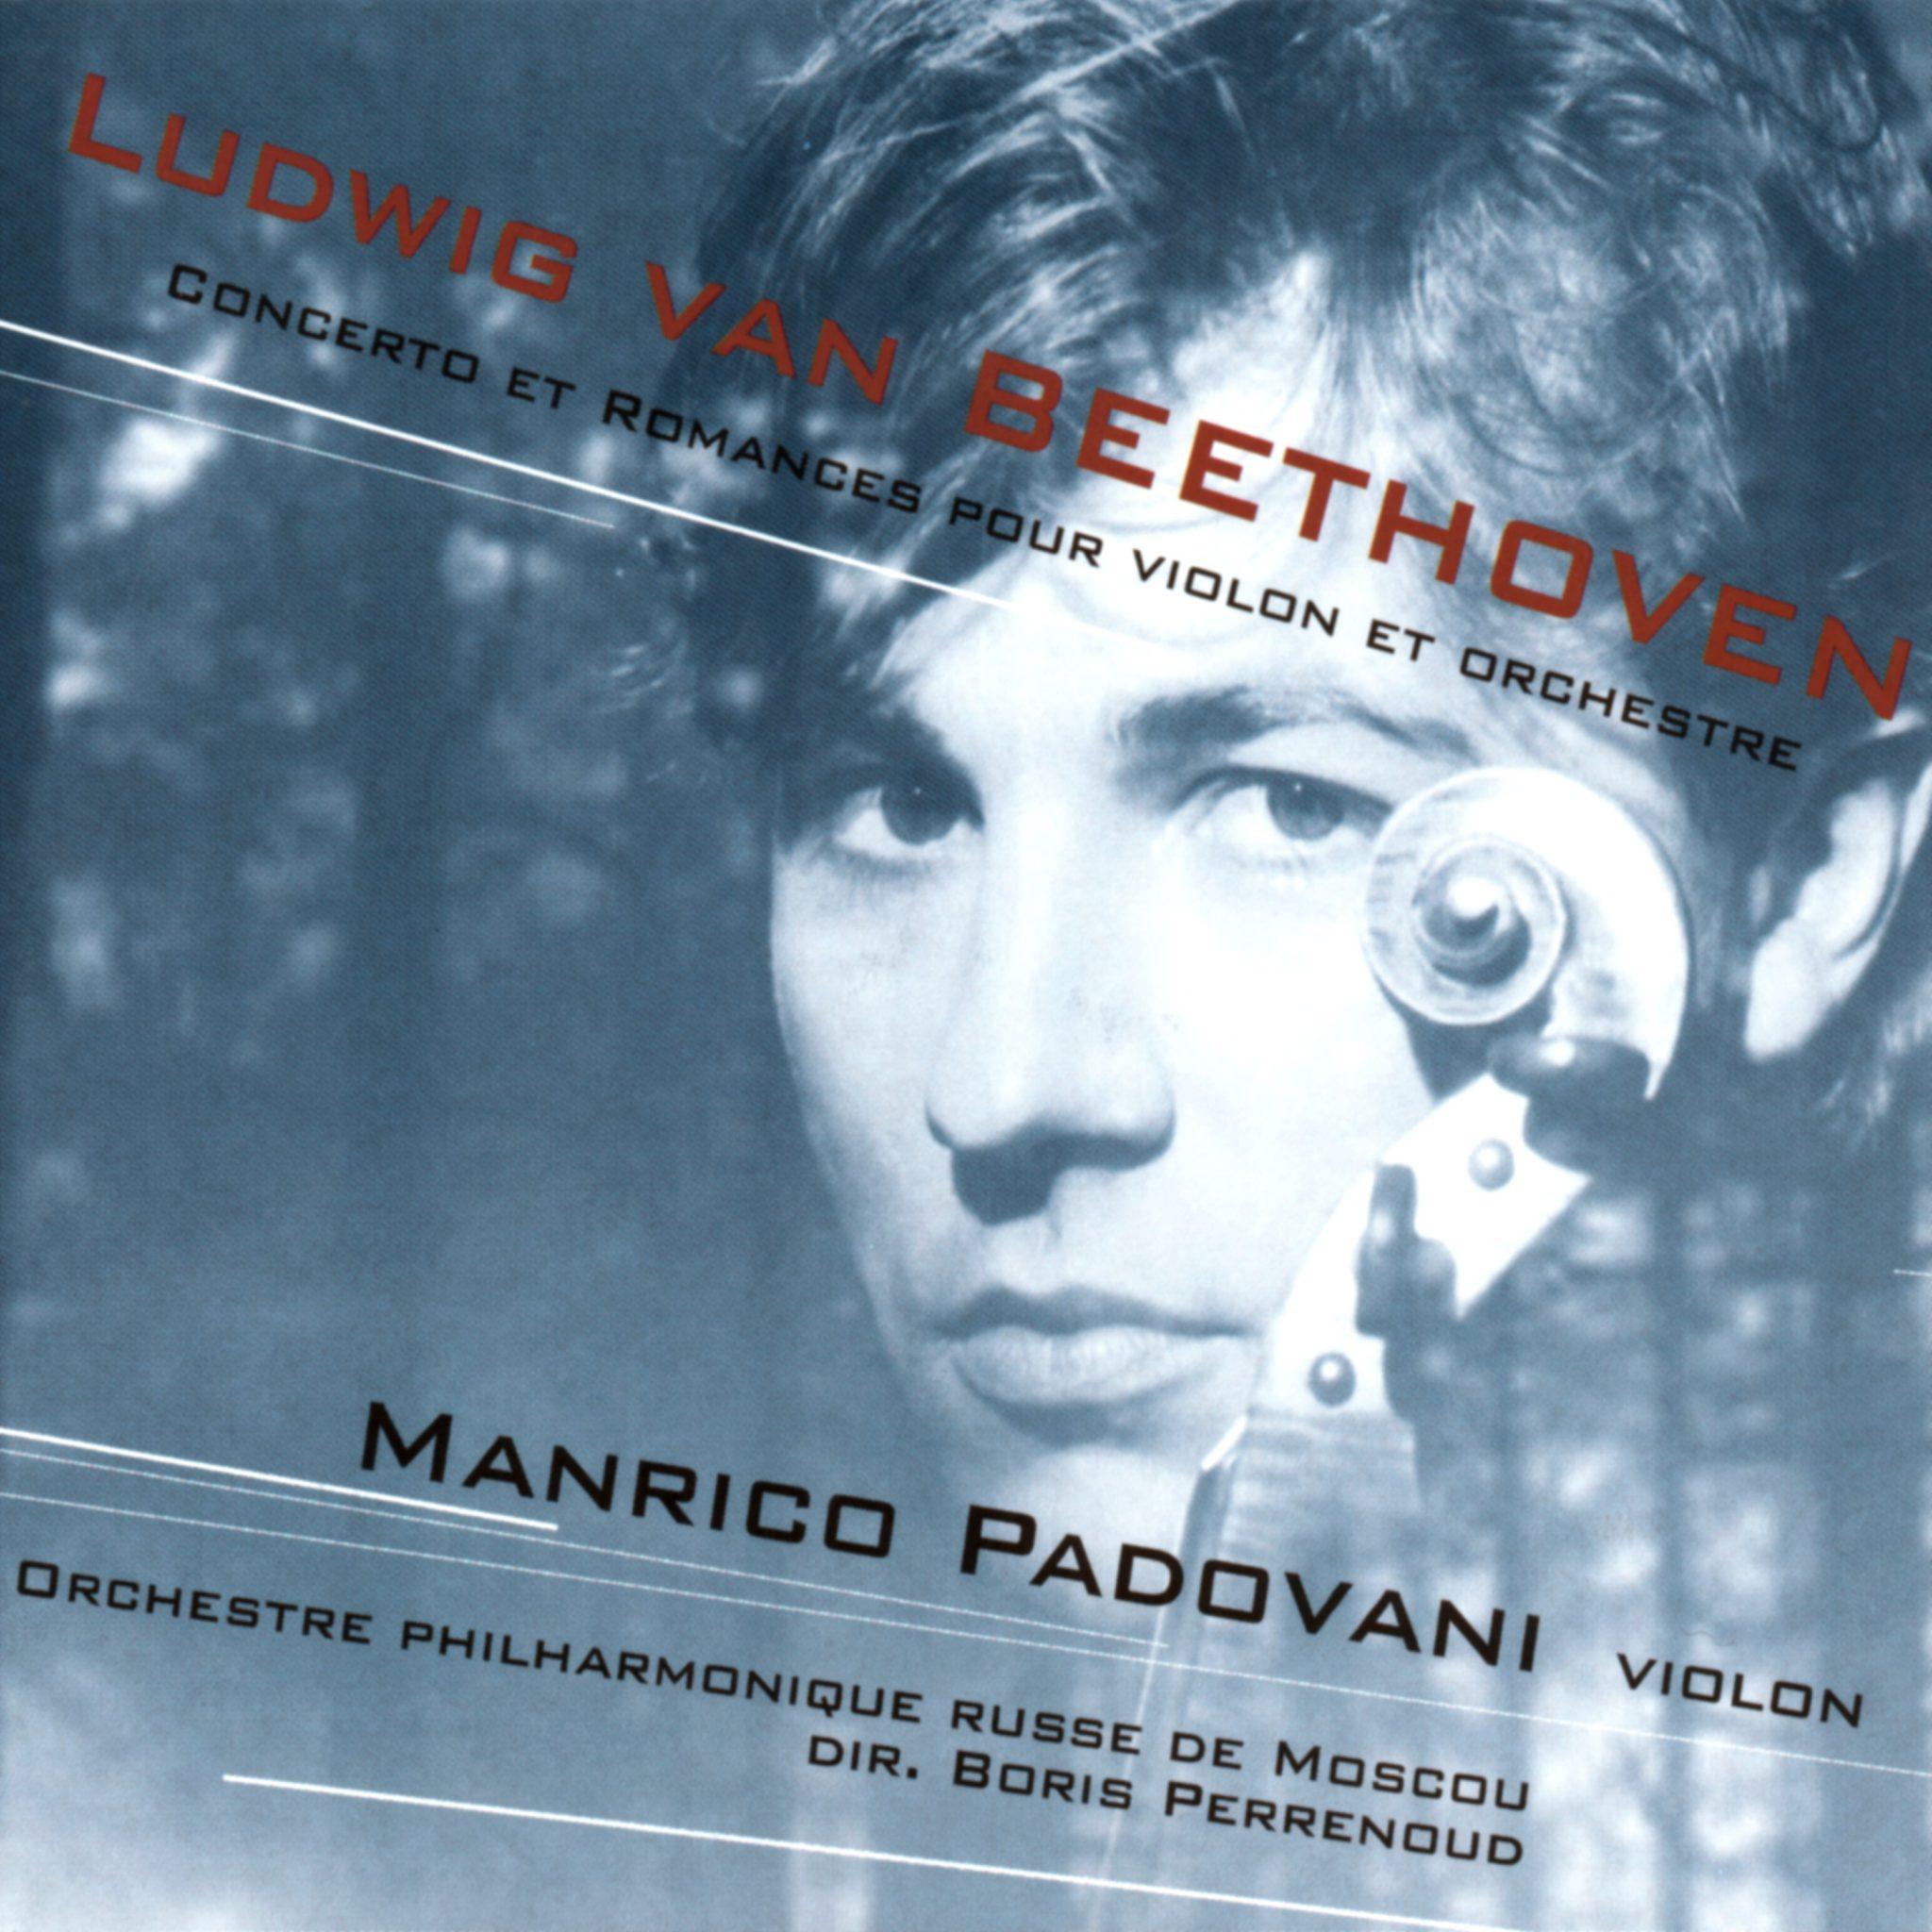 Beethoven - Violin Concerto - Manrico Padovani - Moscow Philharmonic Orchestra